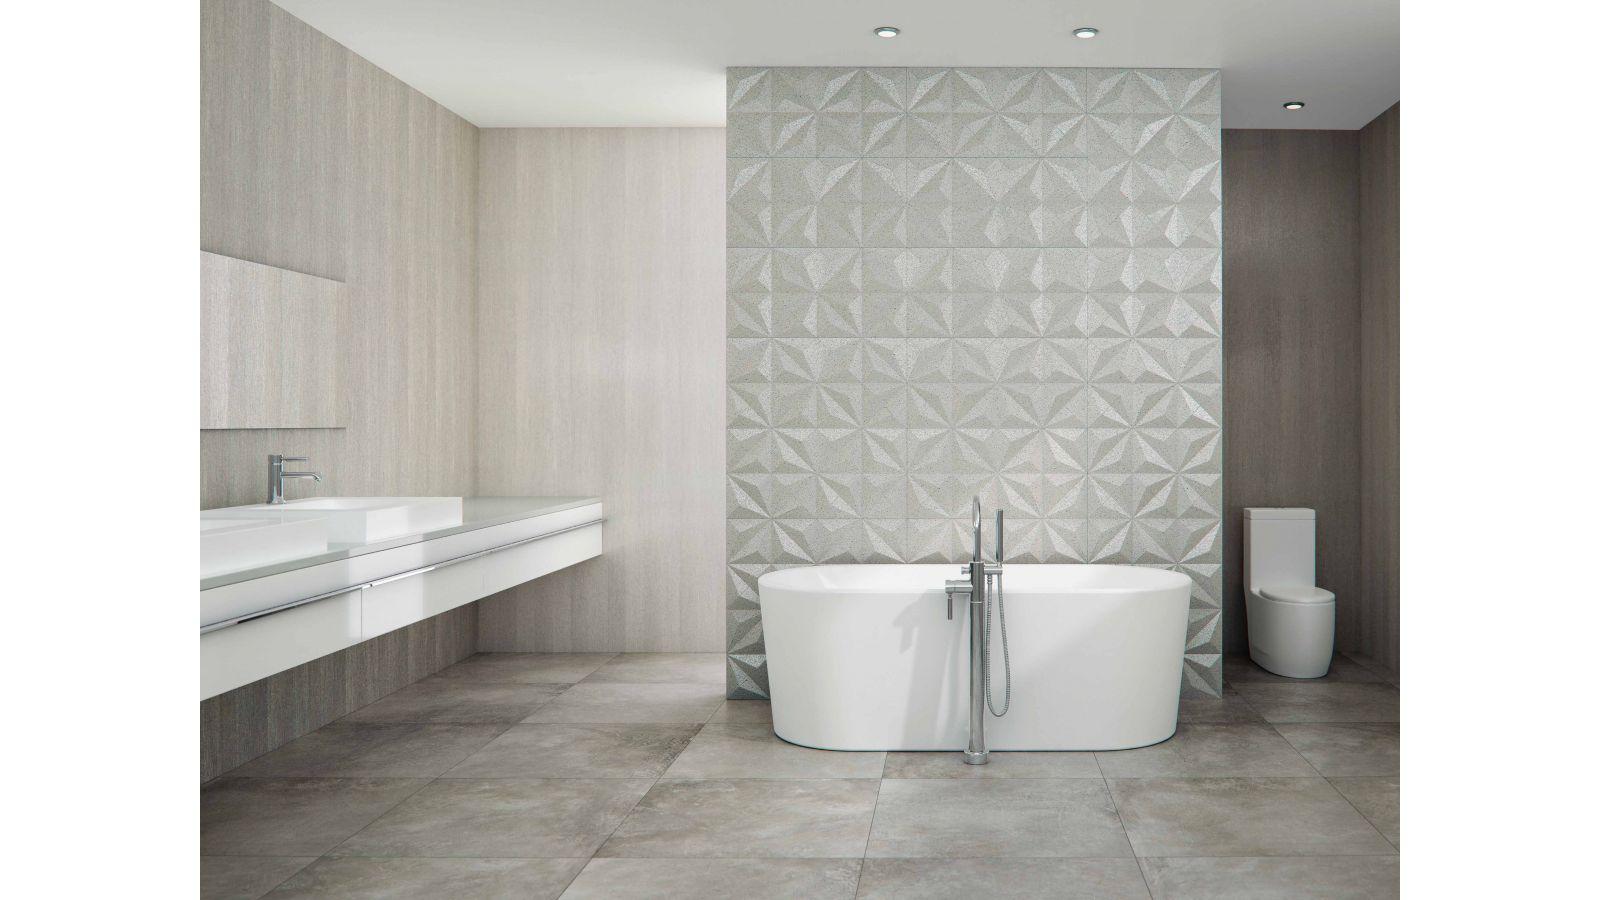 Nice bathtub